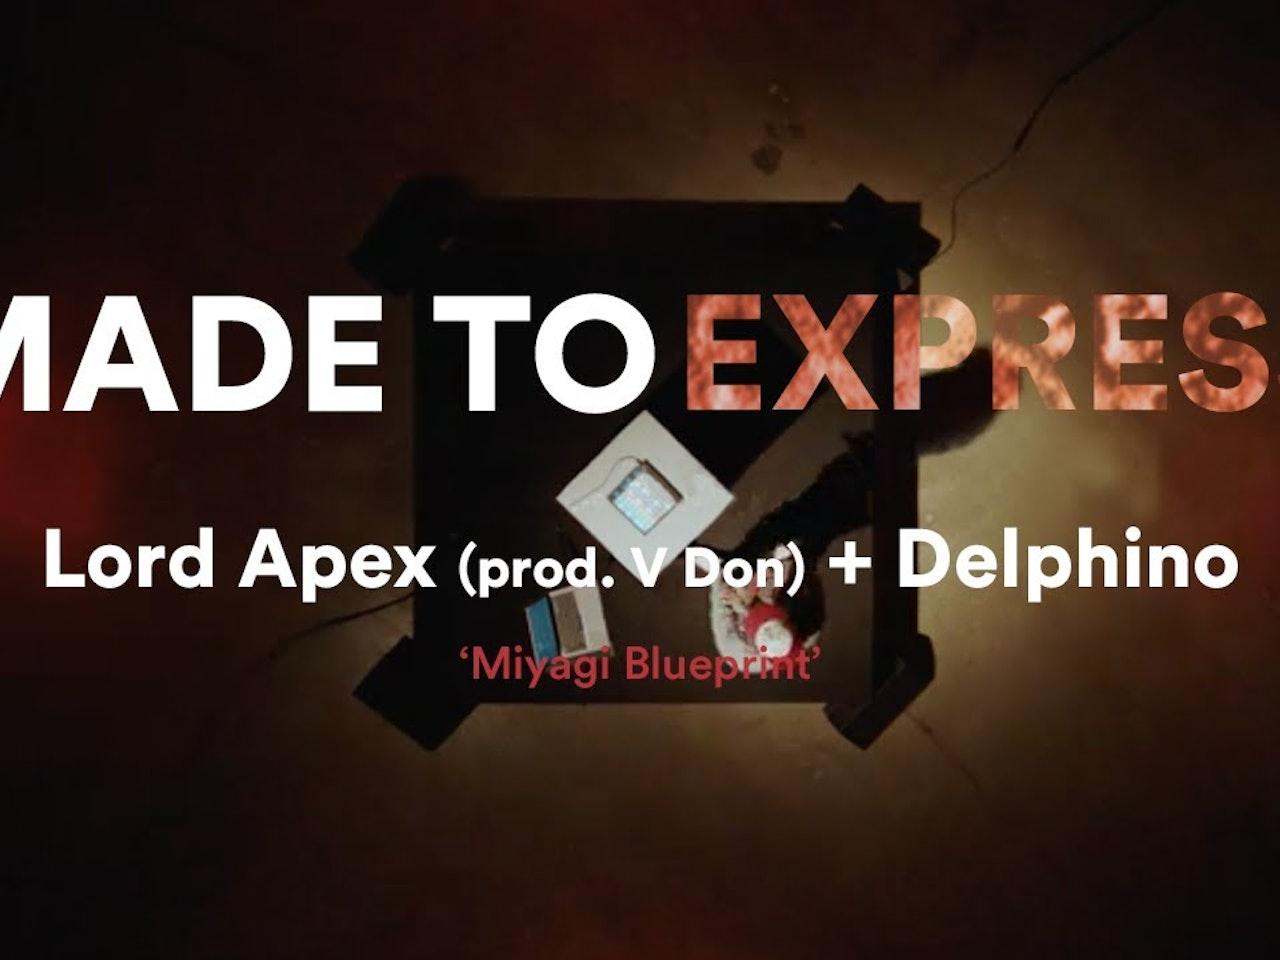 Lord Apex + Delphino 'Miyagi Blueprint' - Made to Express // Novation